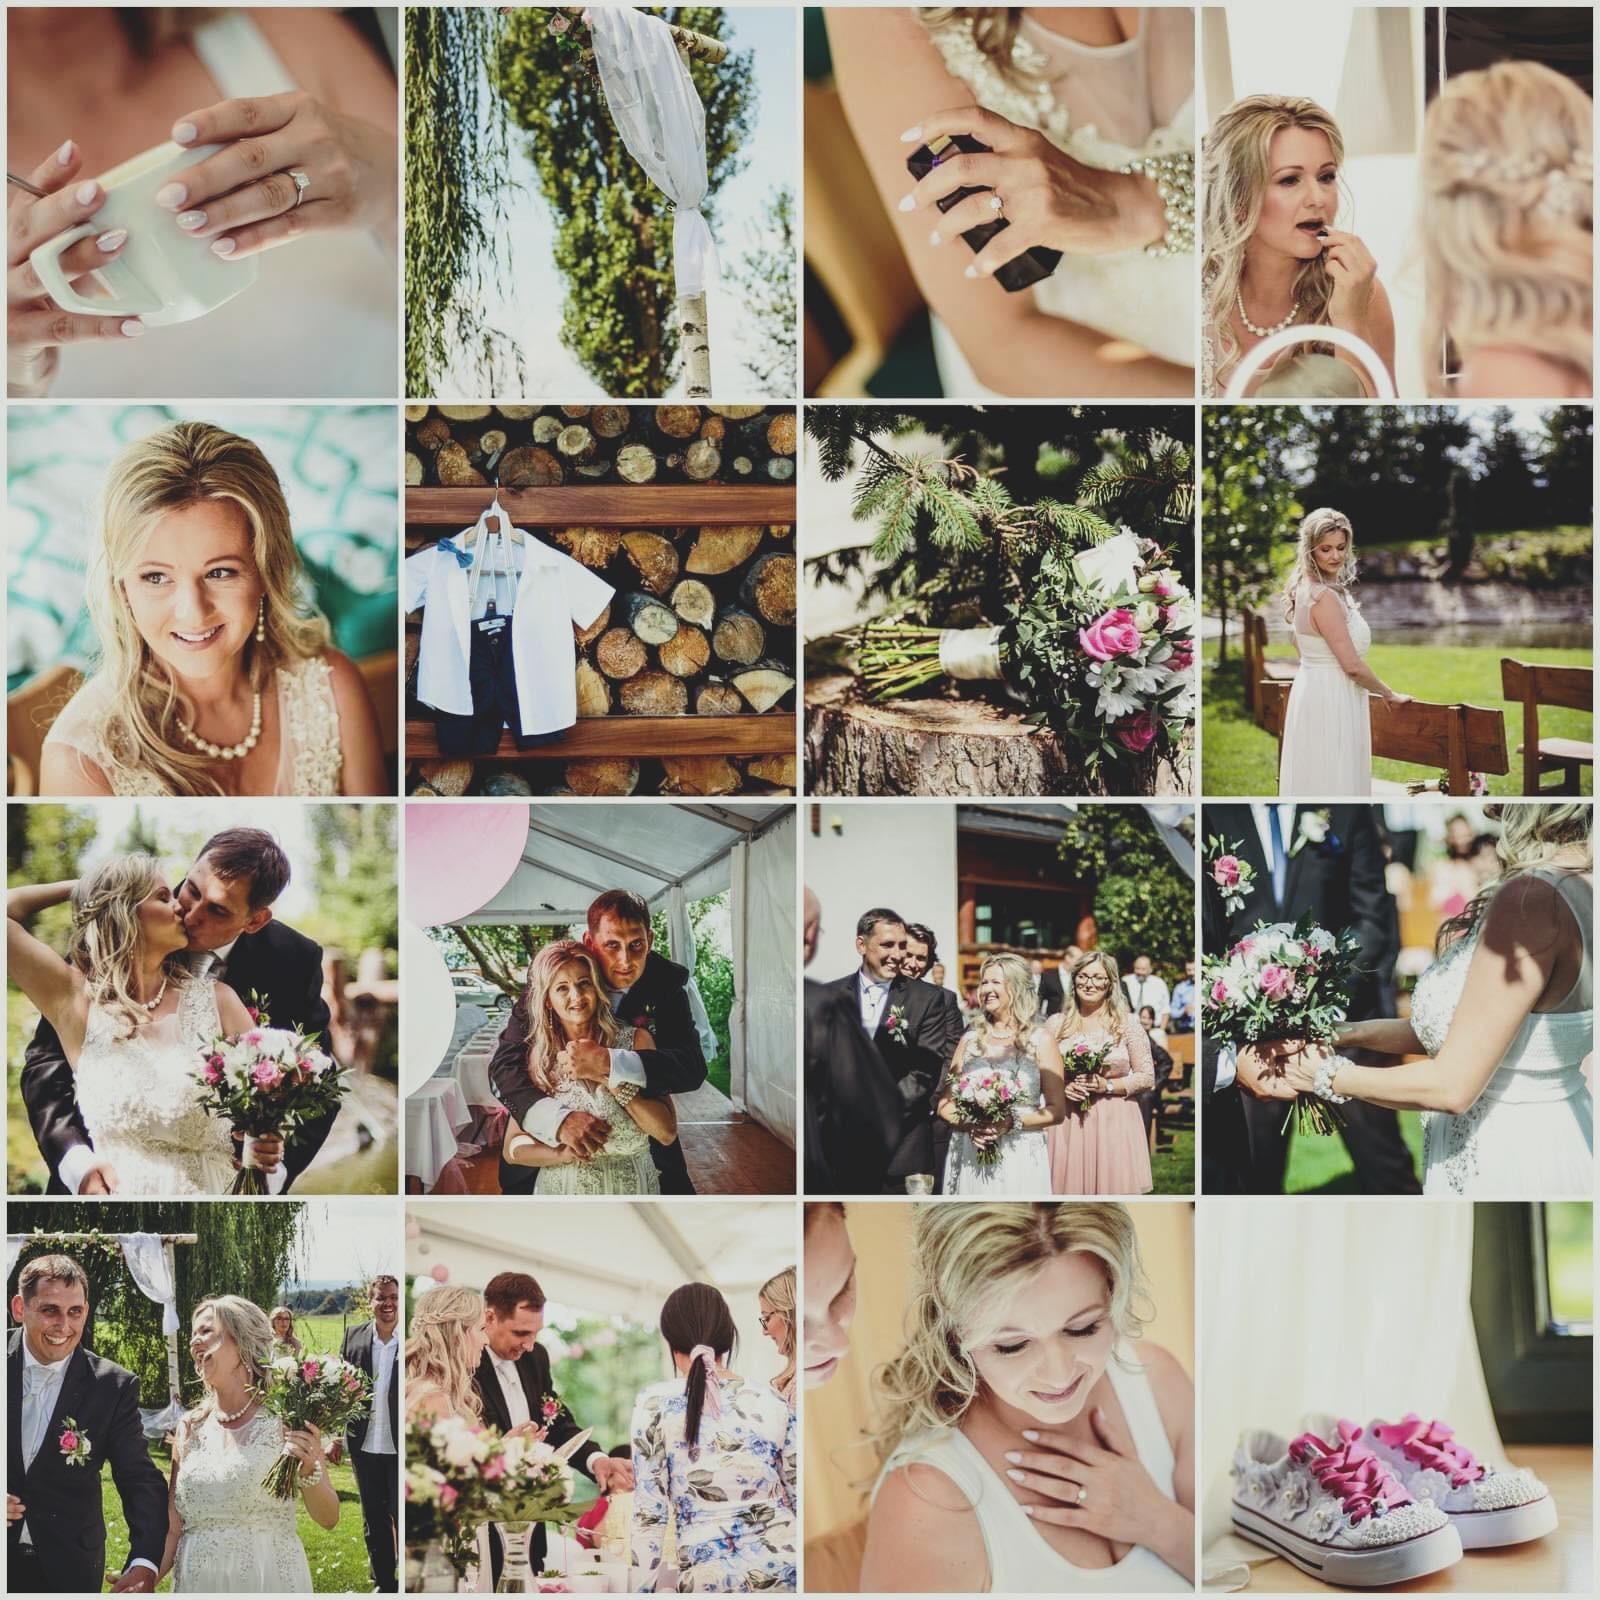 Koláž ze svatby nedaleko Ostravy